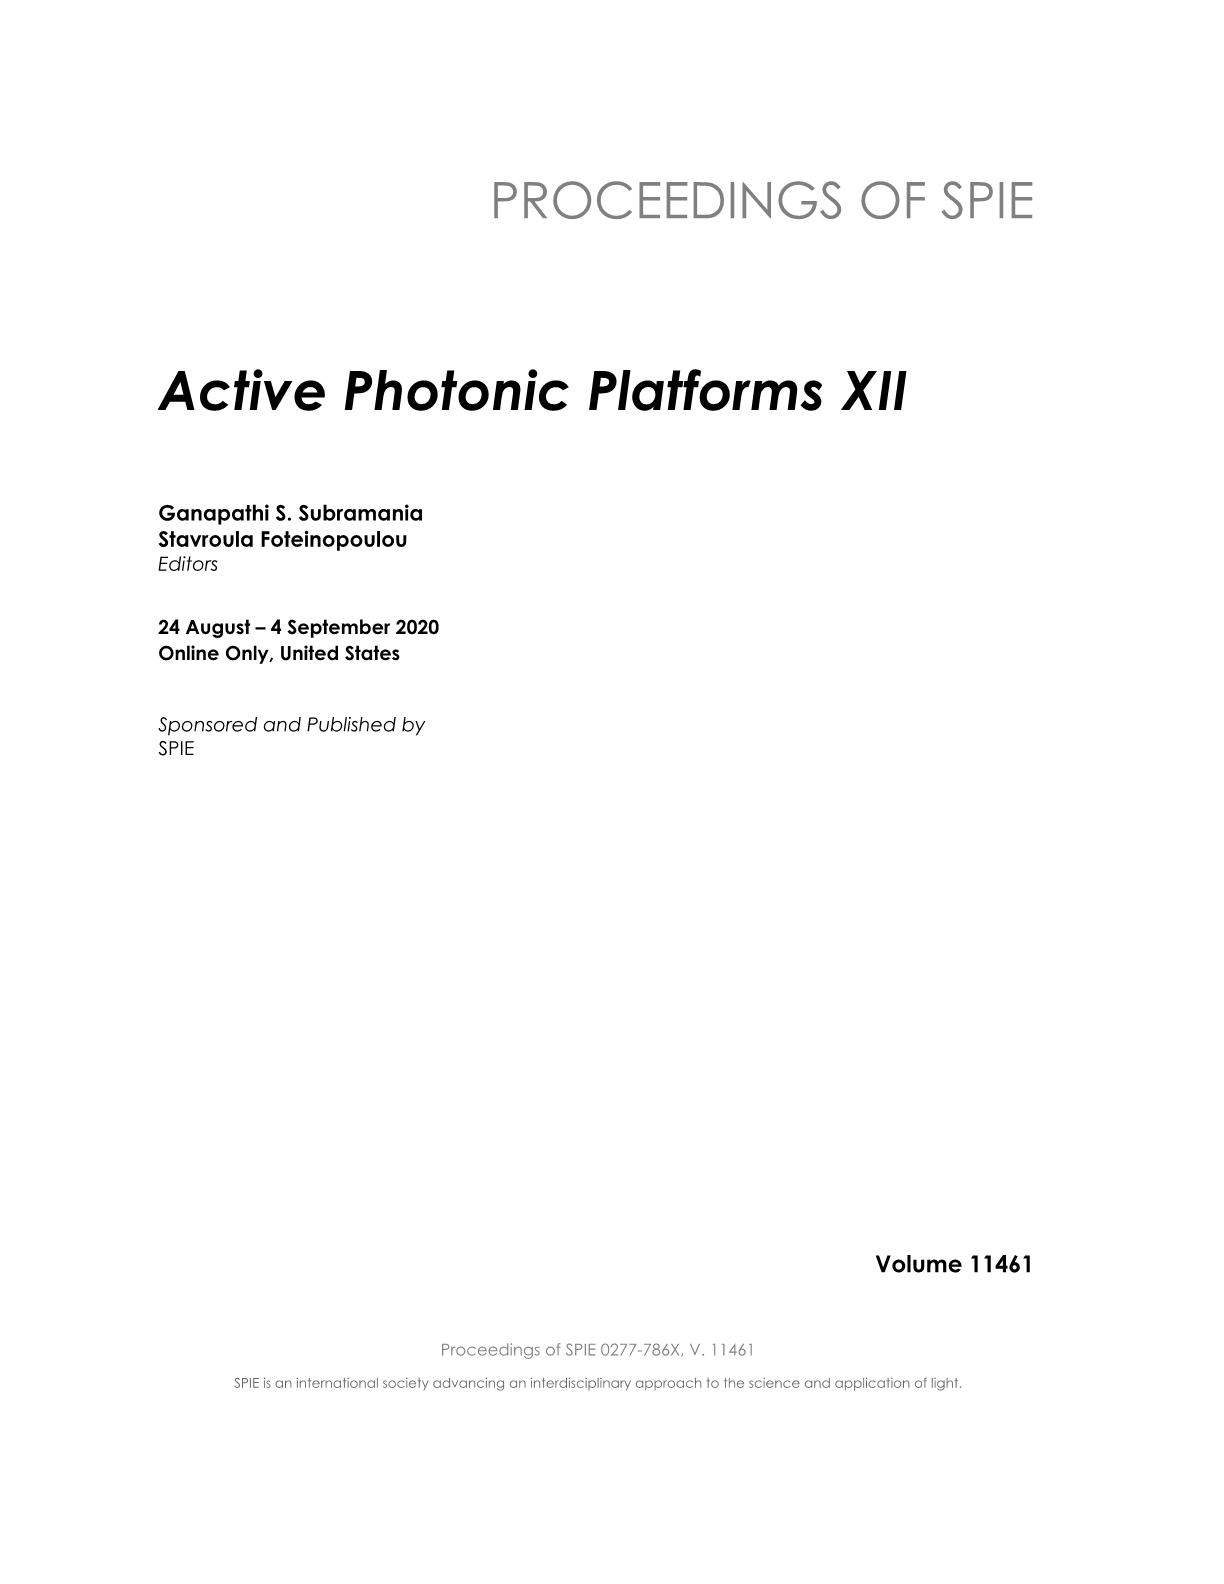 Active Photonic Platforms XII